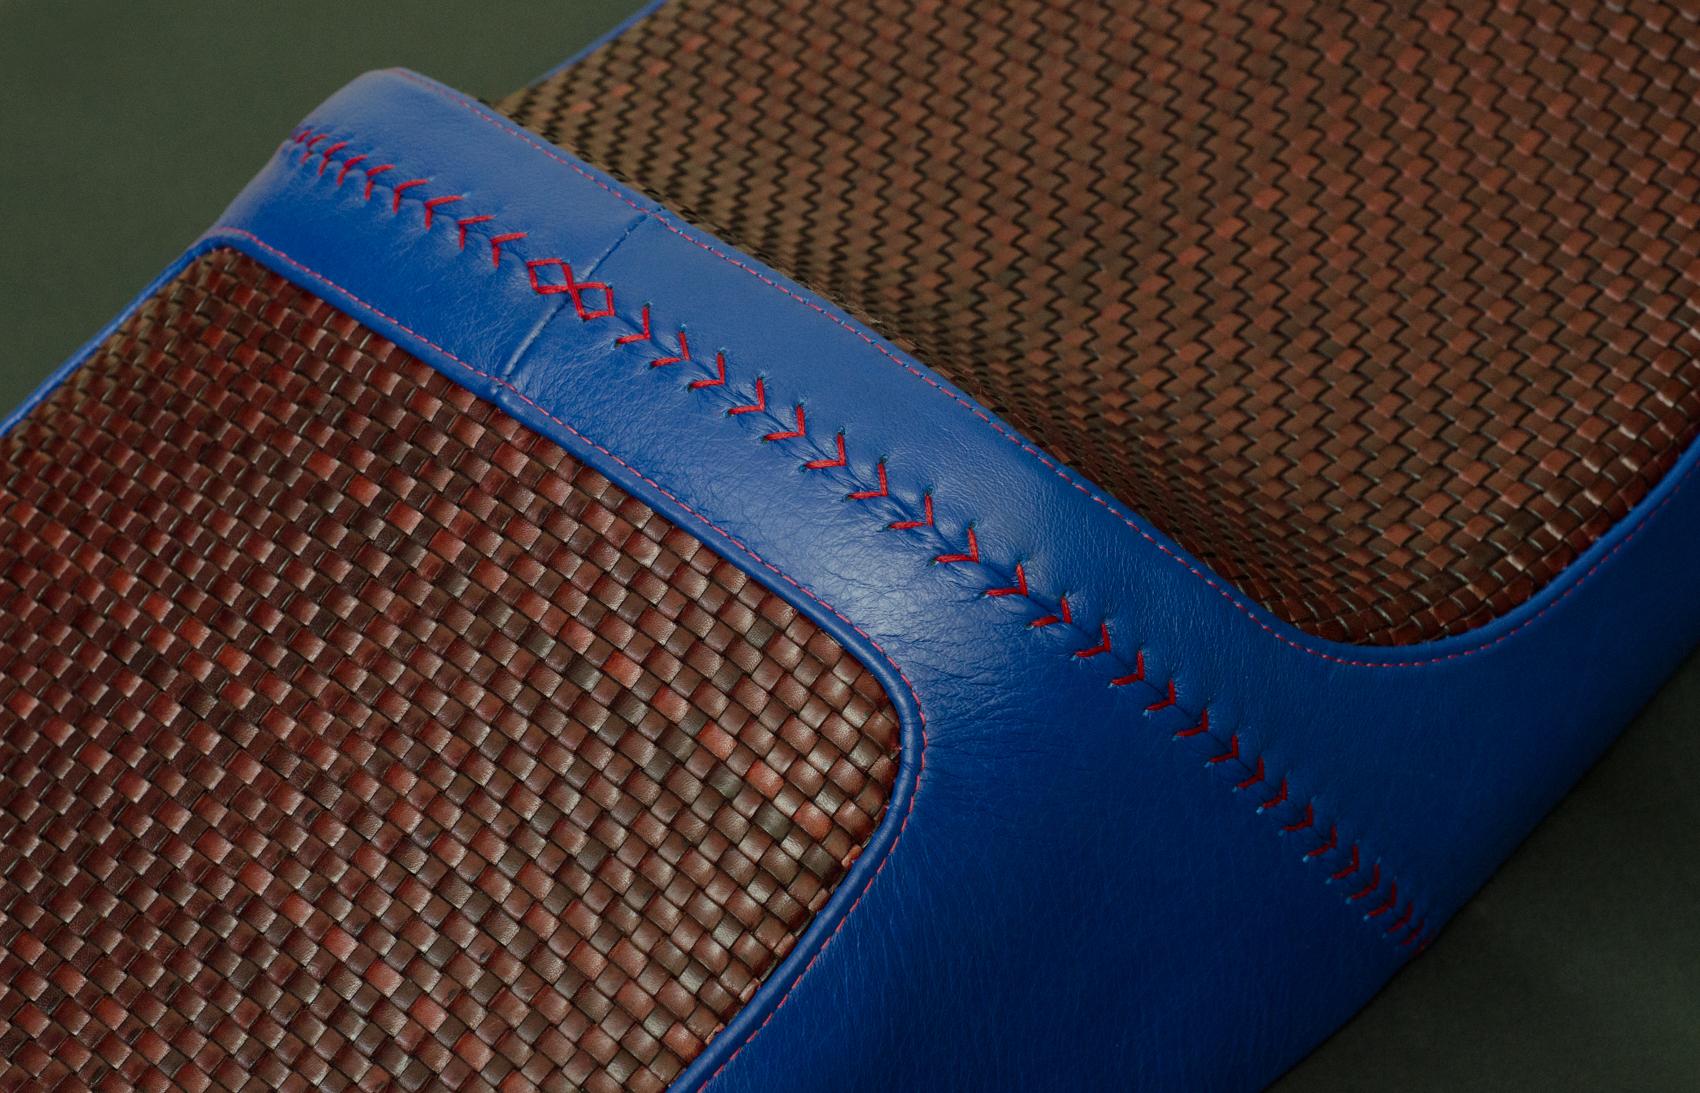 Honda VFR woven rising sun saddle custom leather hand made usa leh cycling goods -6.jpg